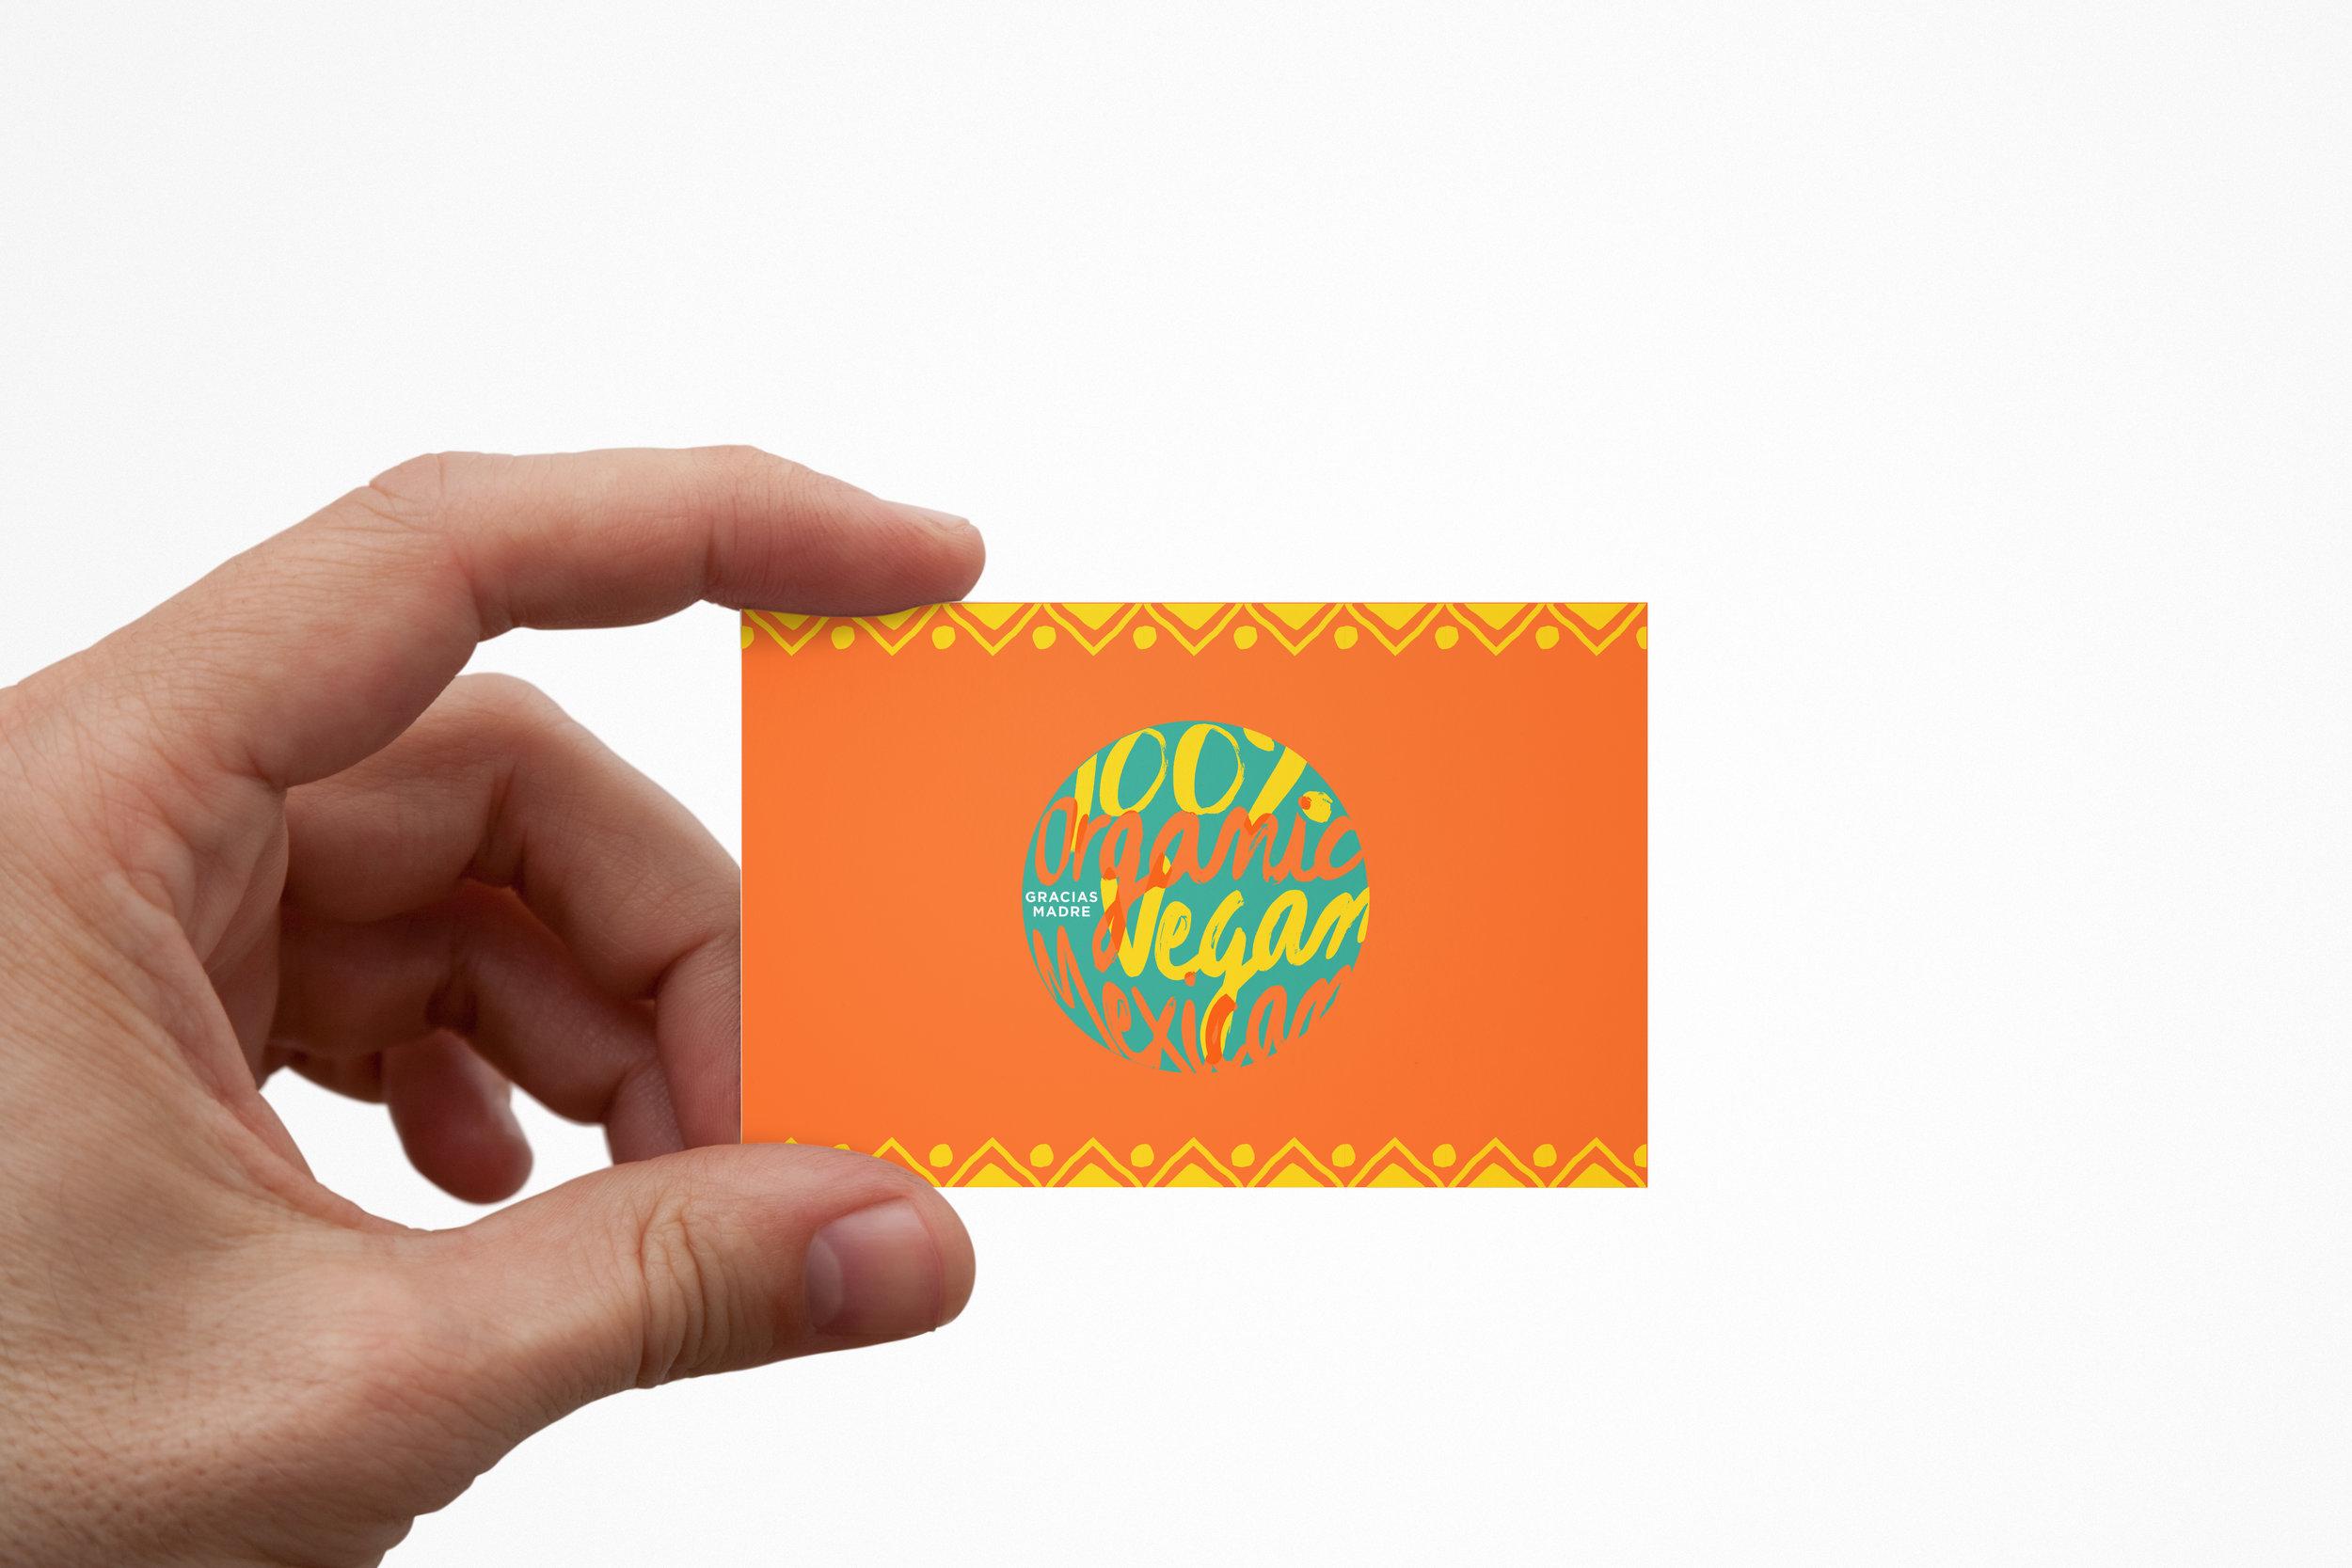 Business card 0493 2017-08-07 copy.jpg